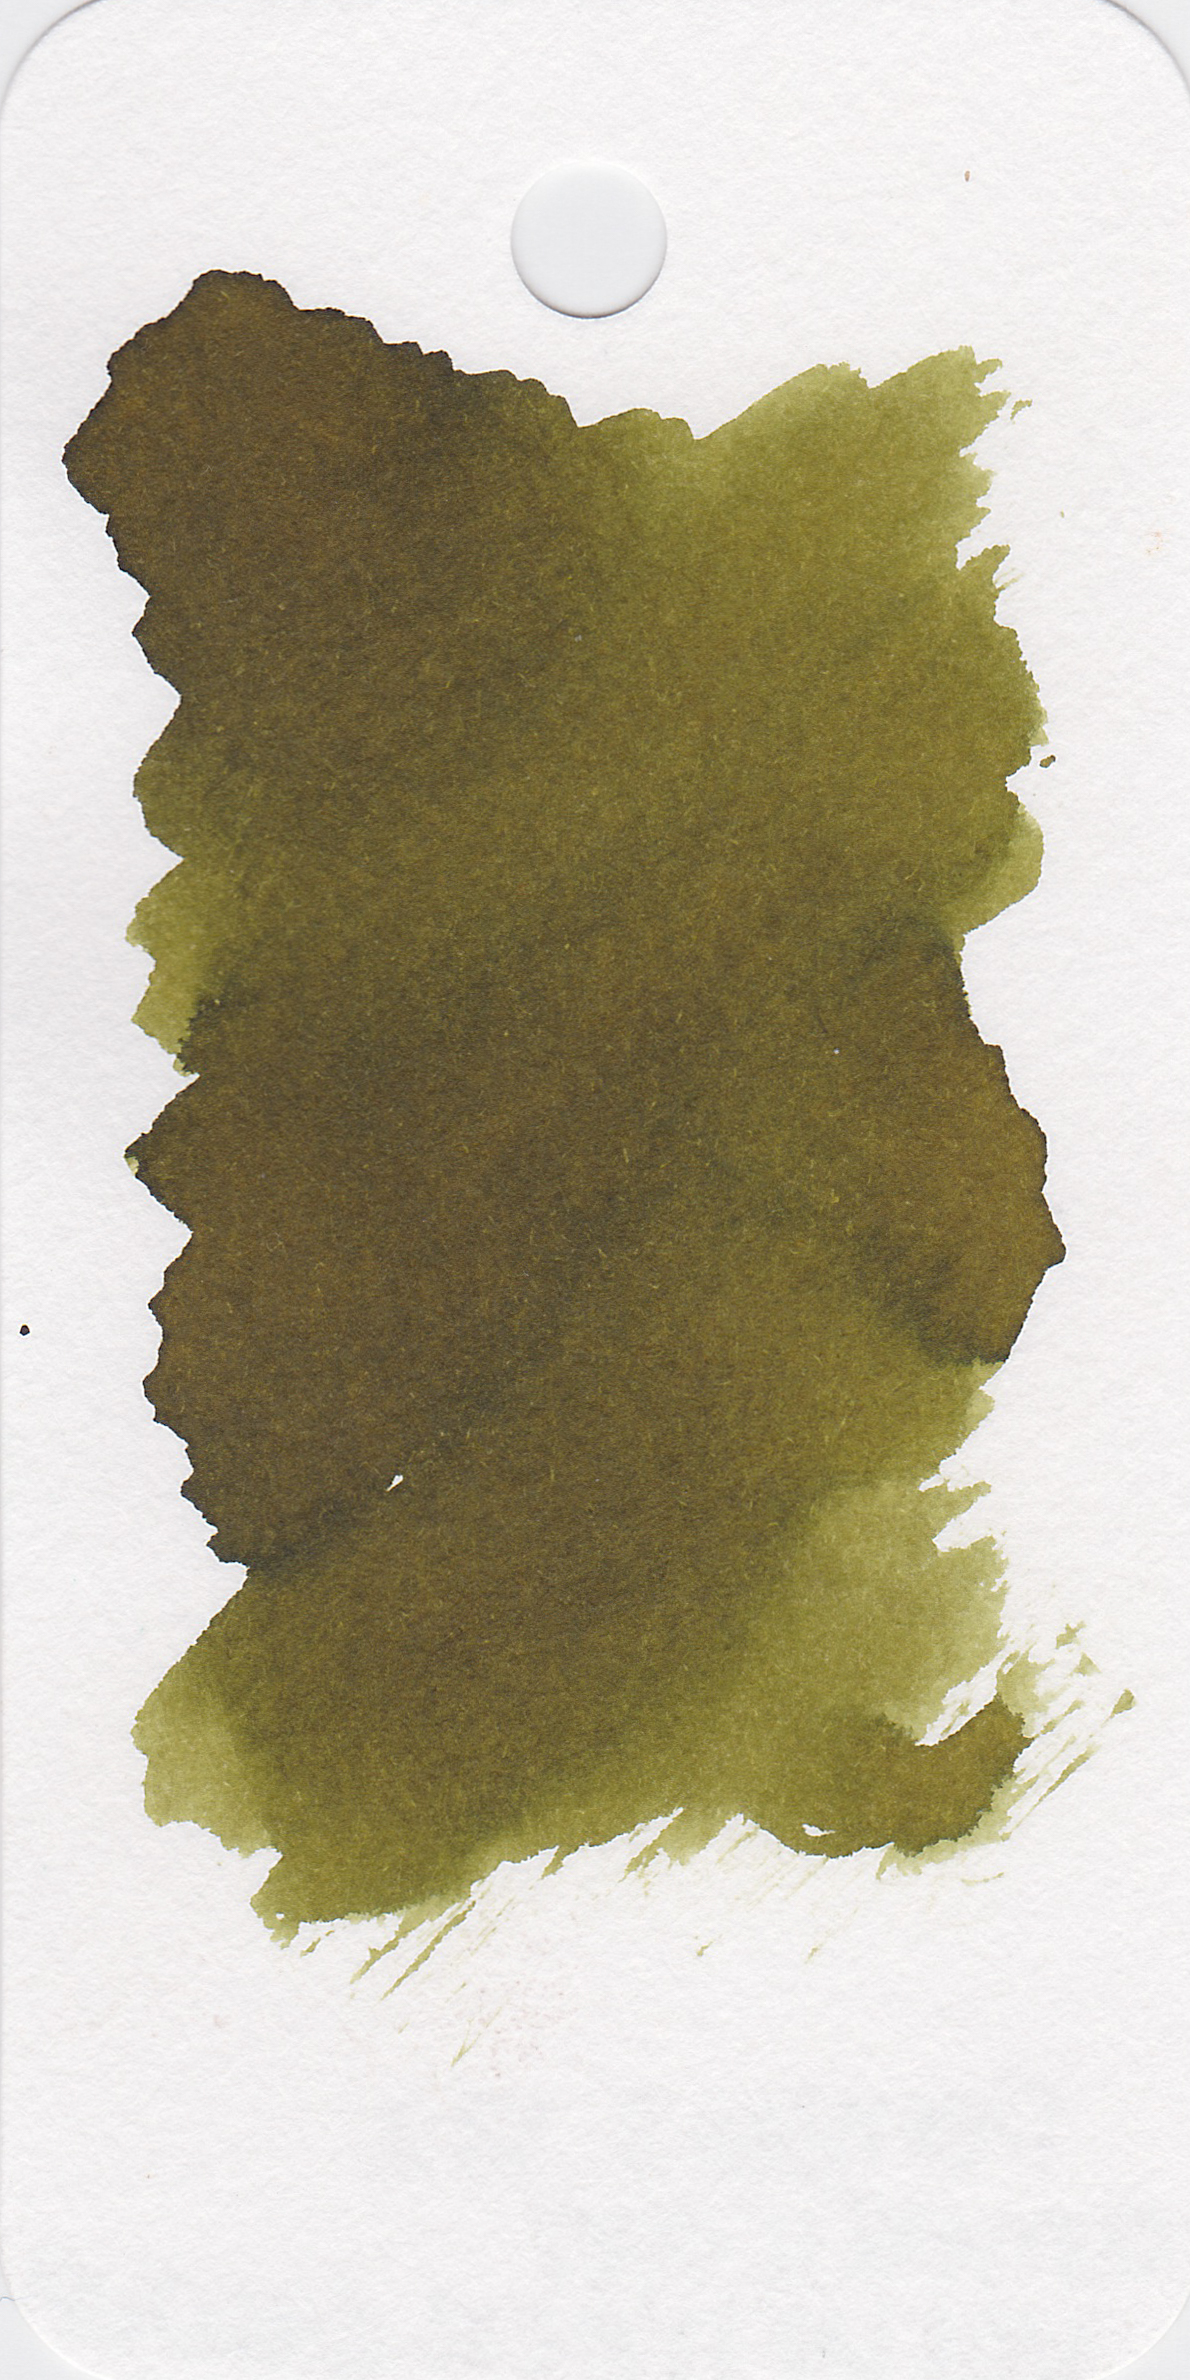 kwz-confederation-brown-2.jpg